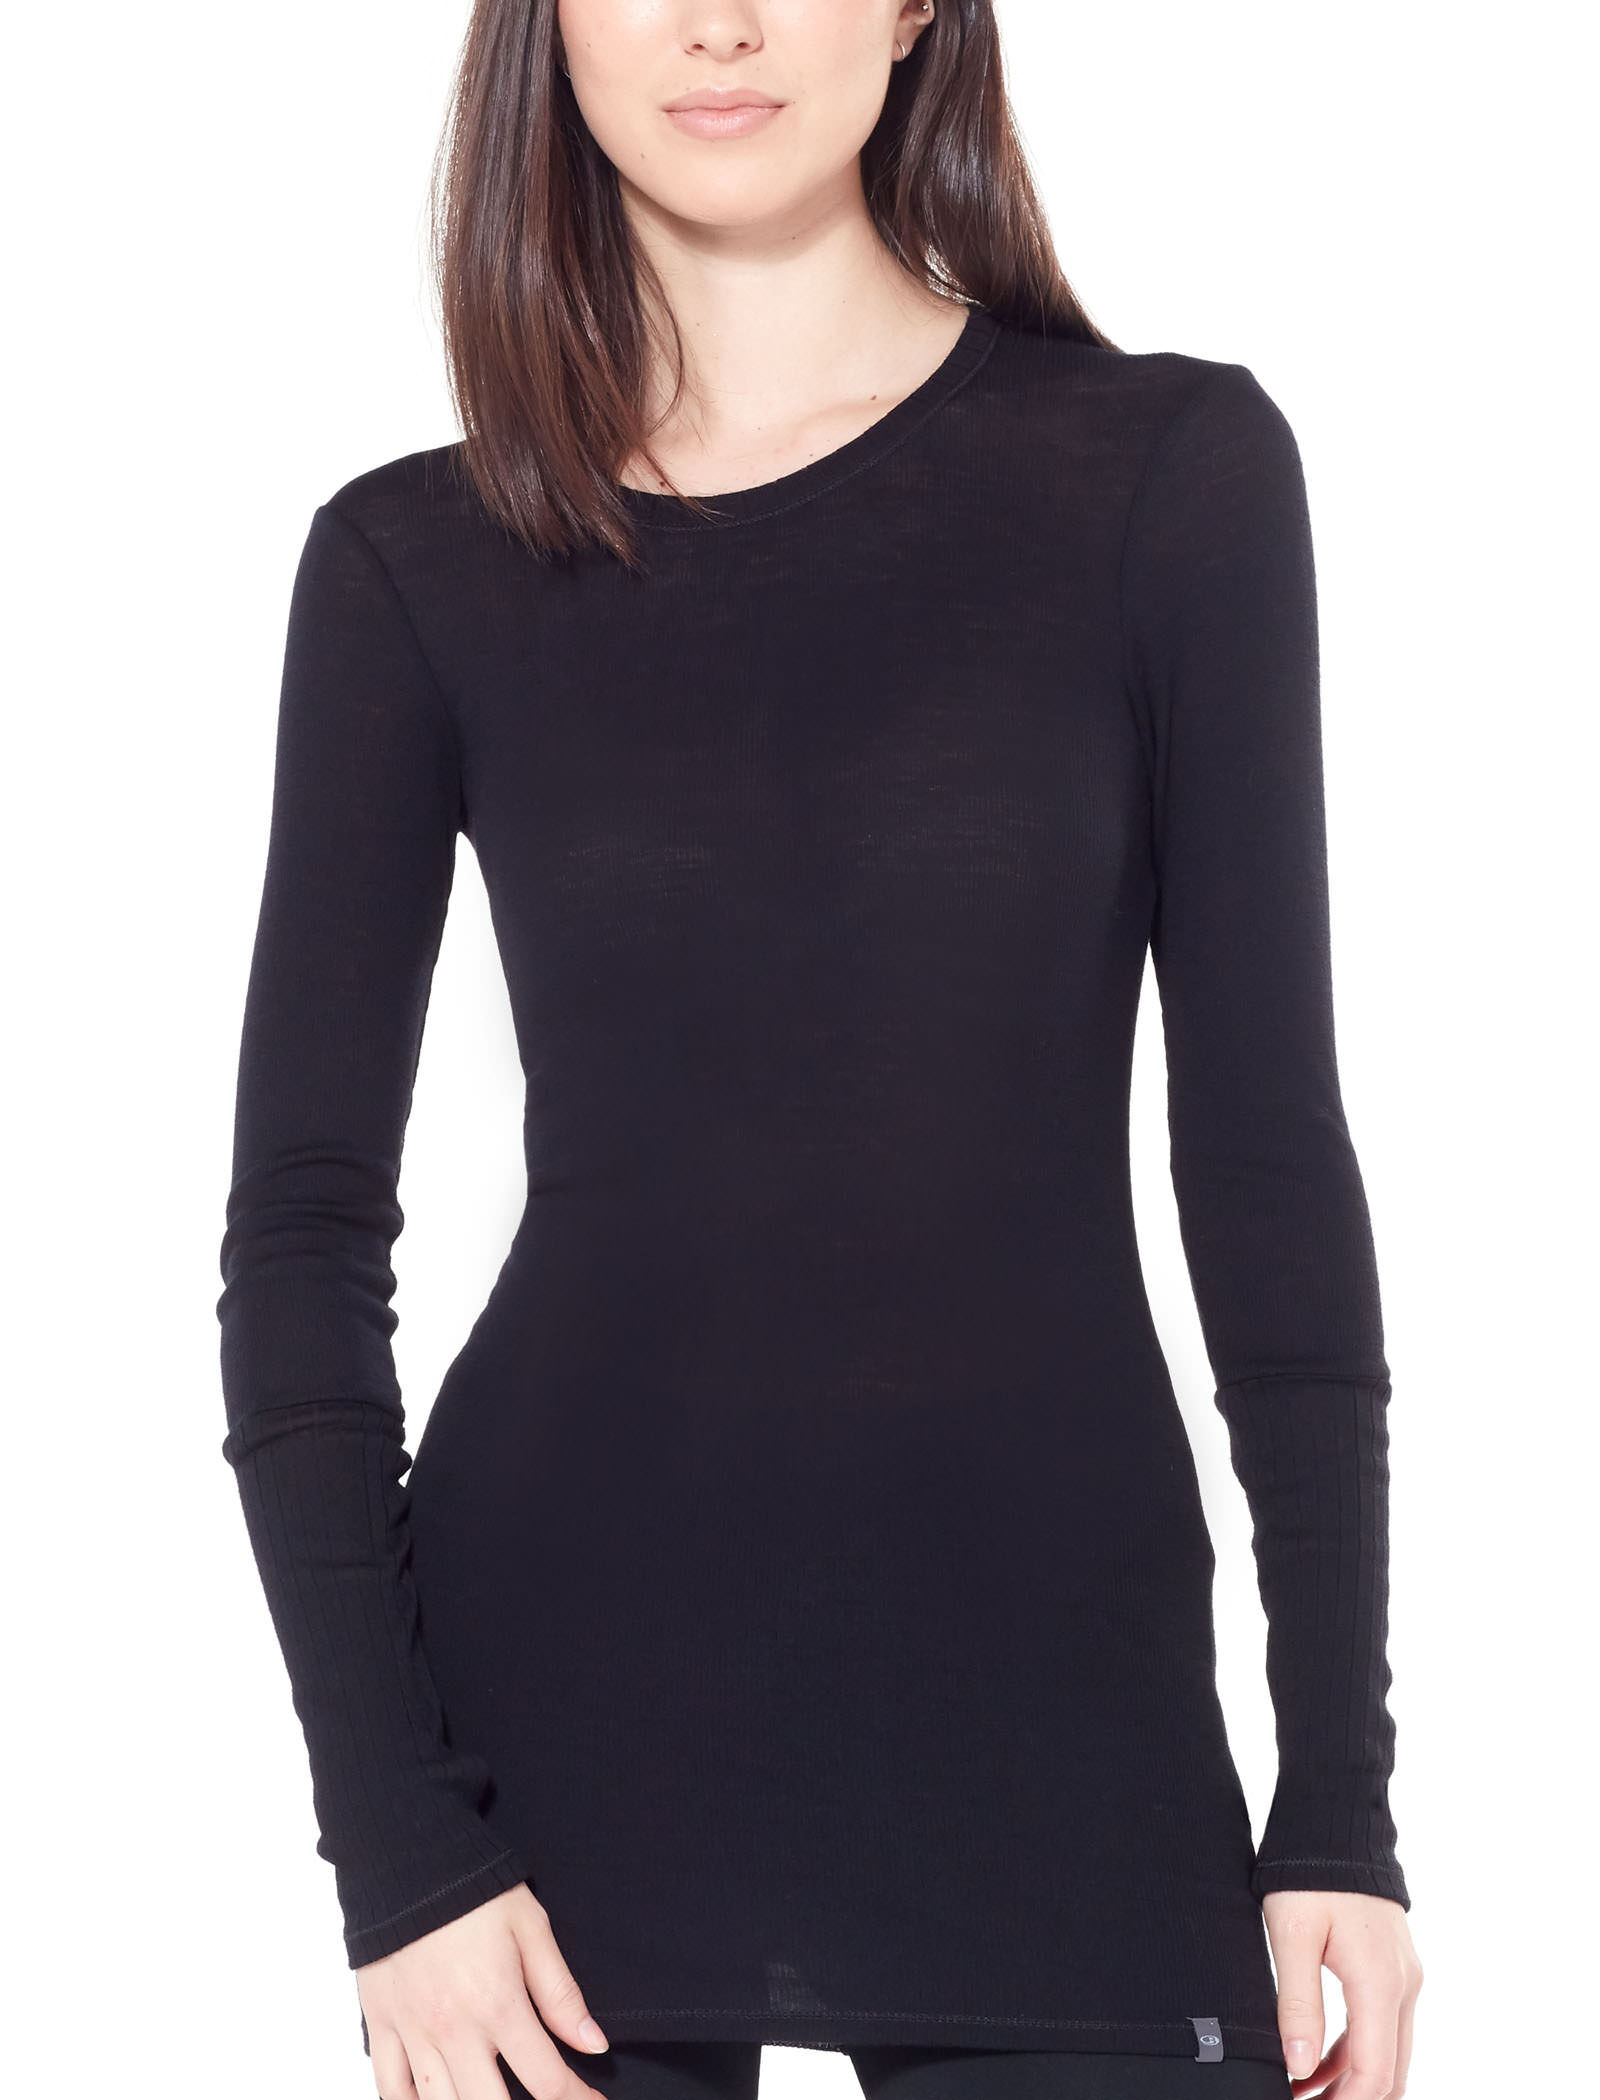 Women's Luxe Rib Long Sleeve Crewe